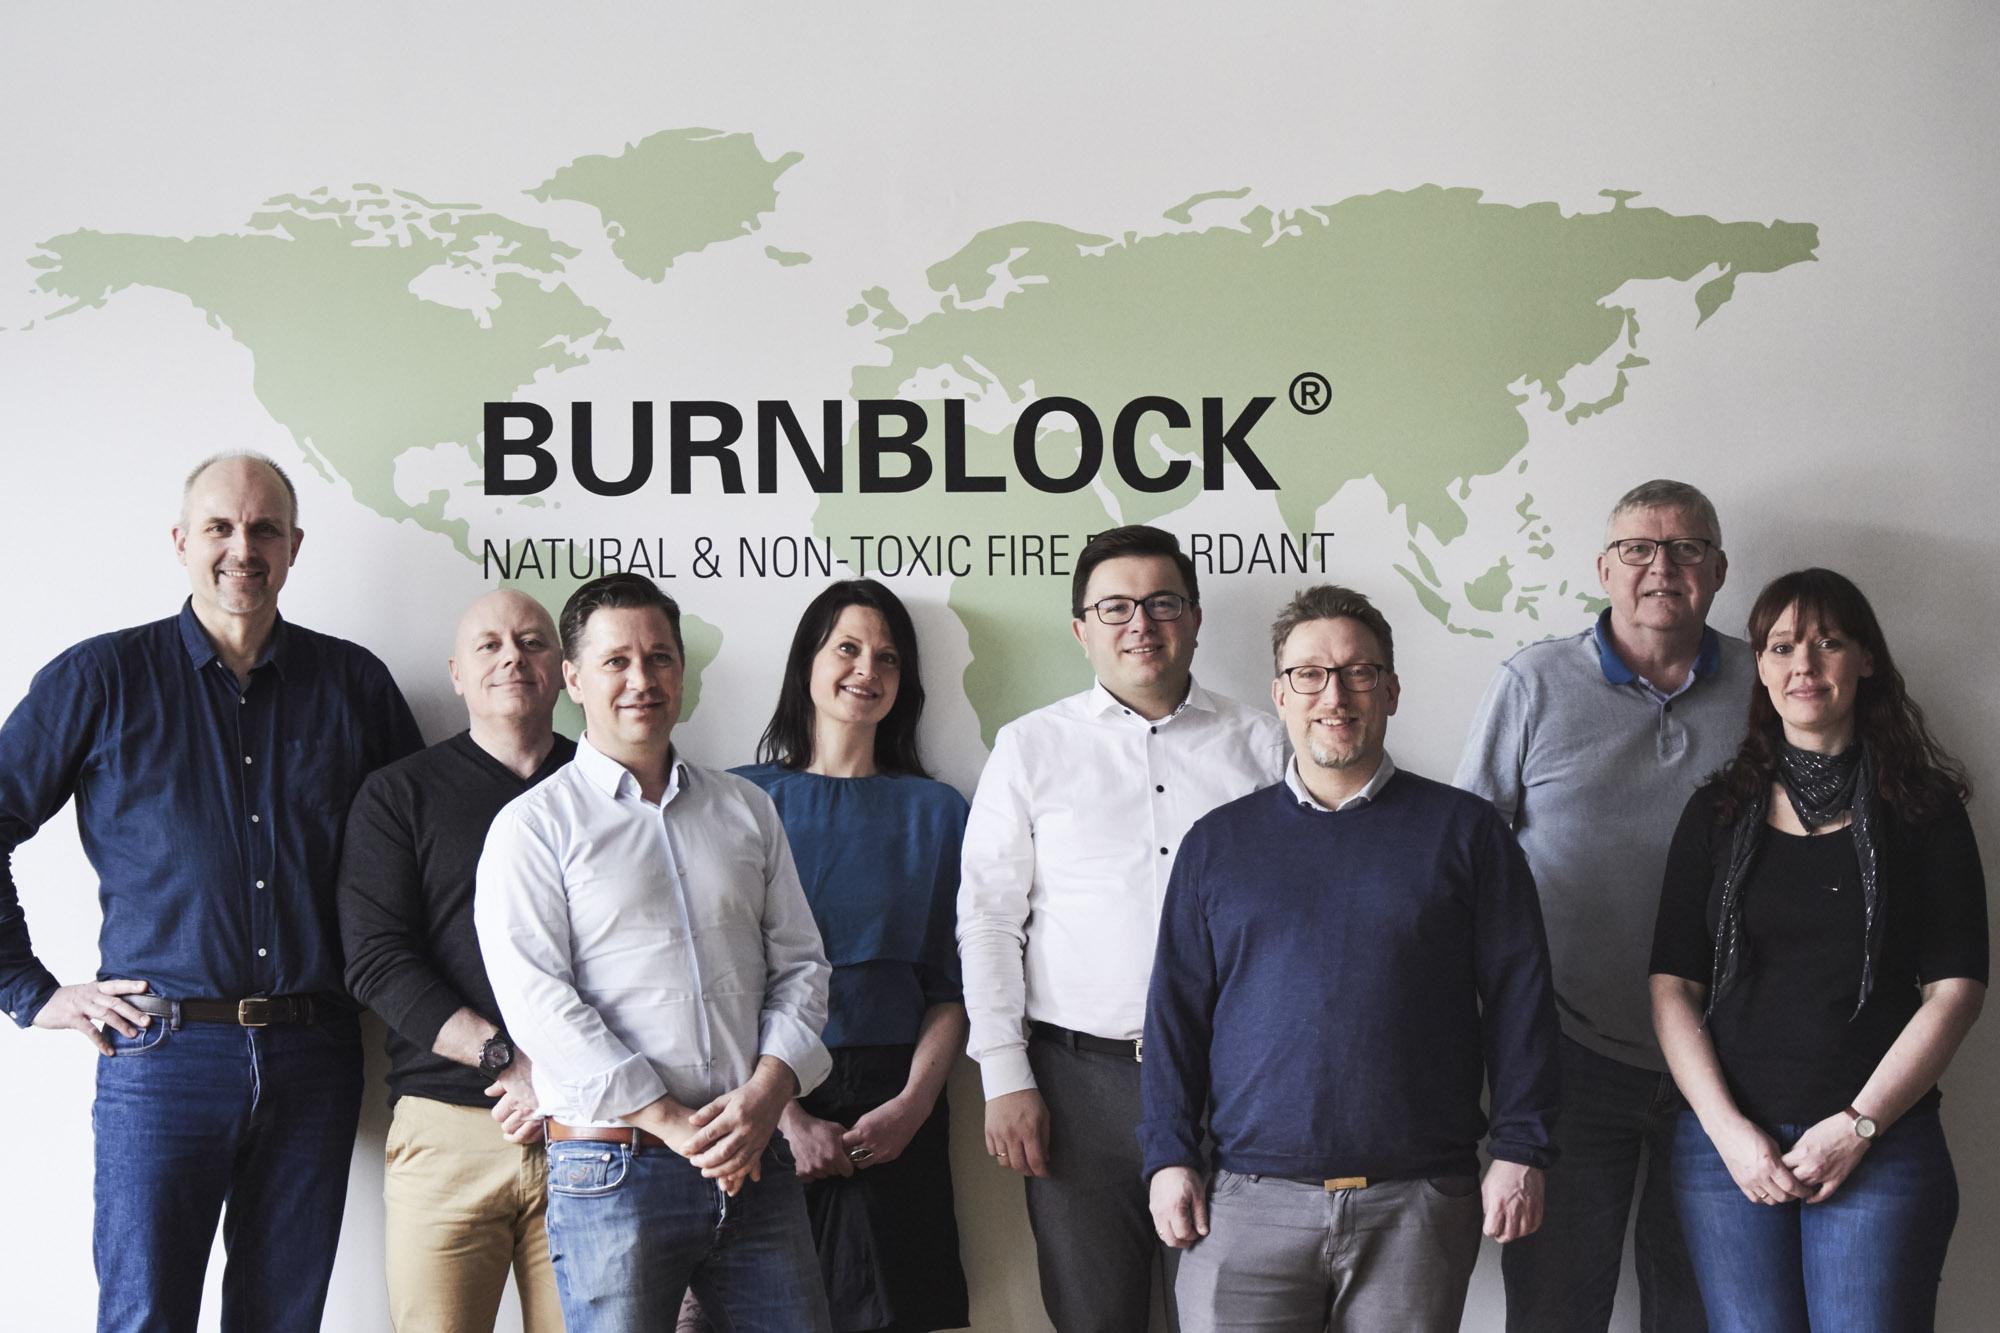 BURNBLOCK TEAM